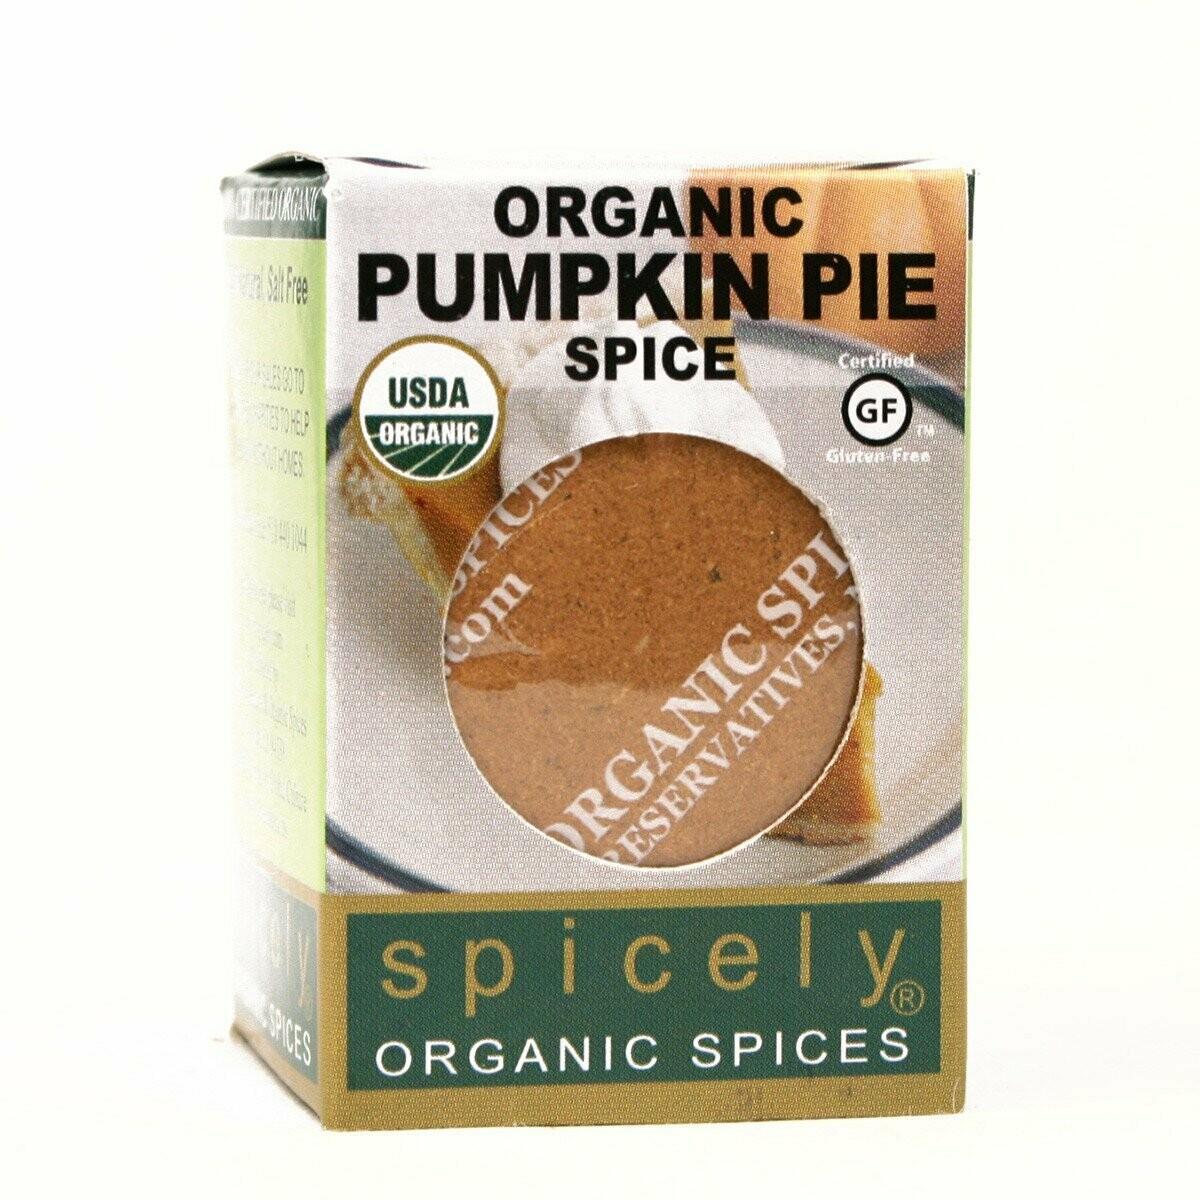 Organic Pumpkin Pie Spice